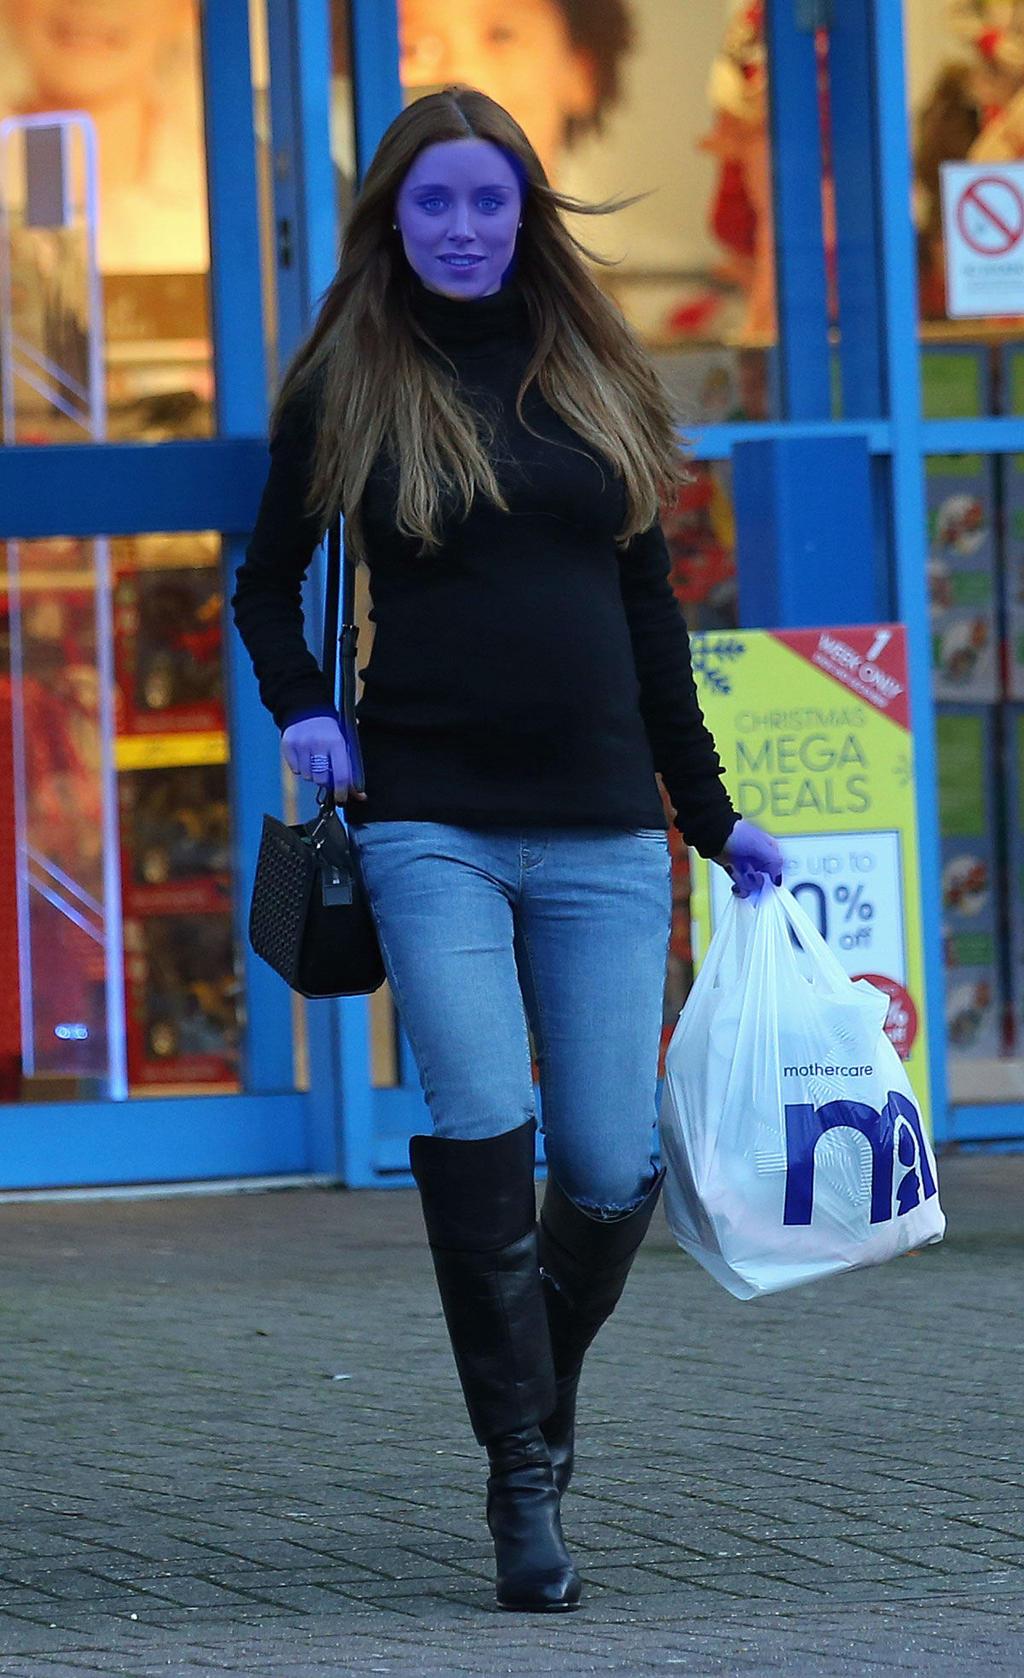 Baby Shopping by scotishjoker1edits